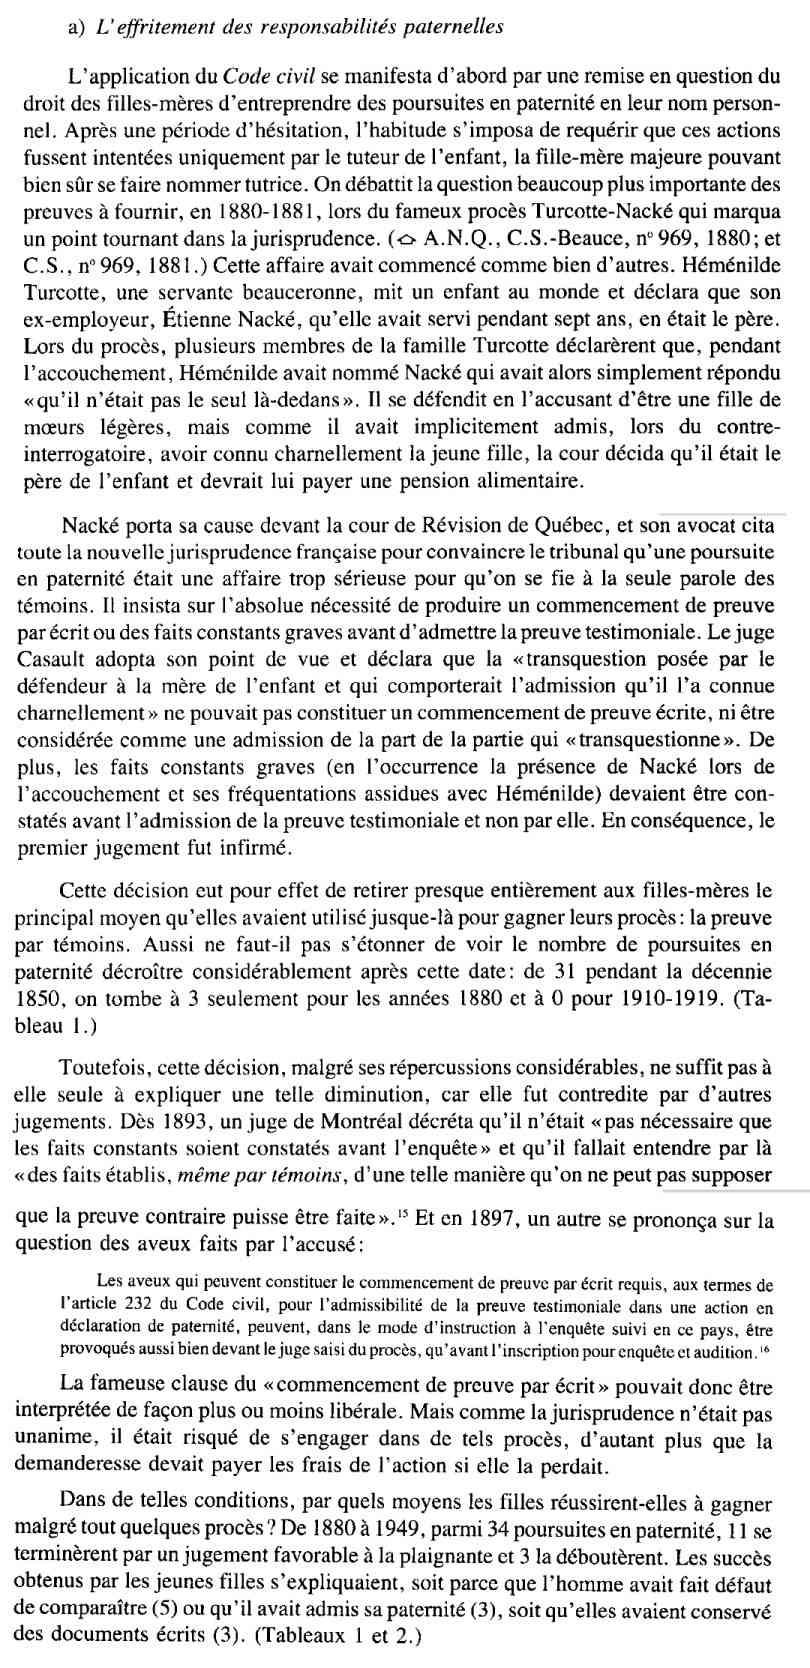 Hénédine Turcotte, Beauce  CORRECTION: Hénédine et non Herménilde ou Héménilde Extrai10